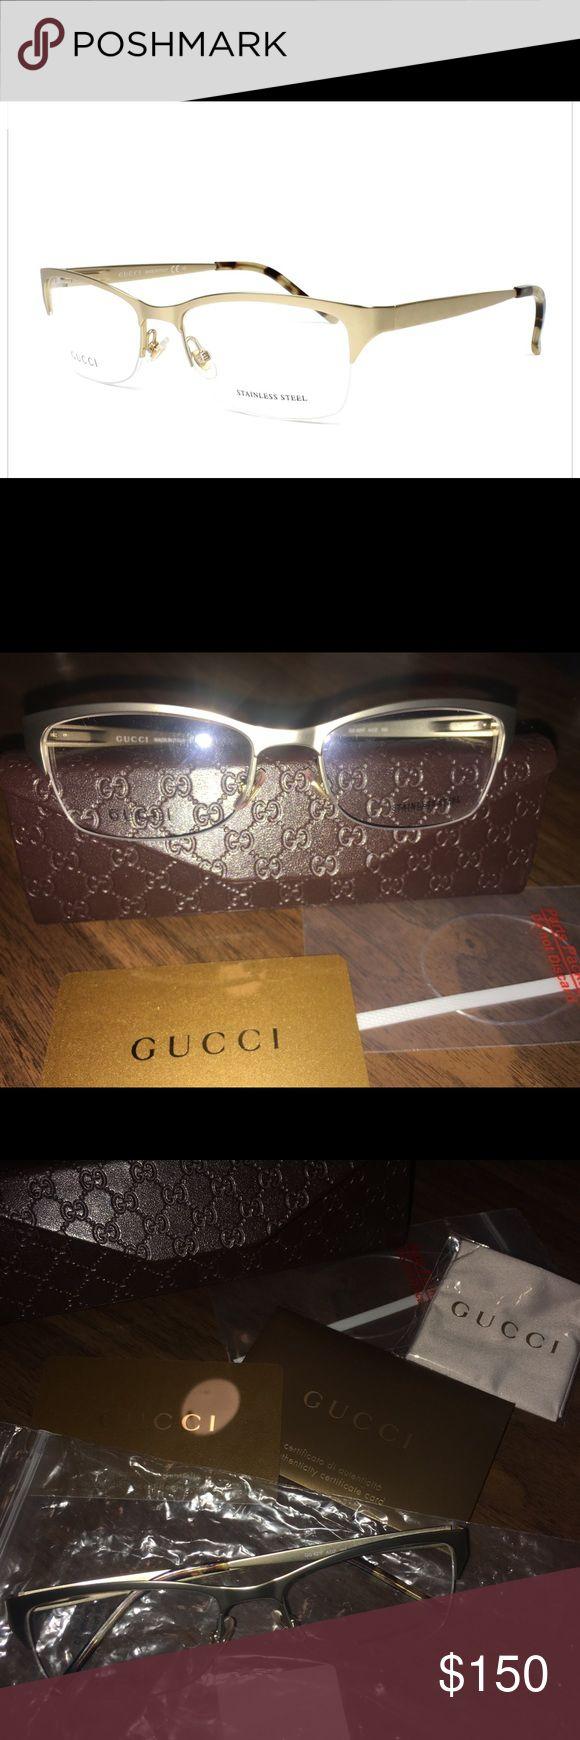 Gucci prescription eyeglass frame Light Gold Metal frame Gucci Accessories Glasses